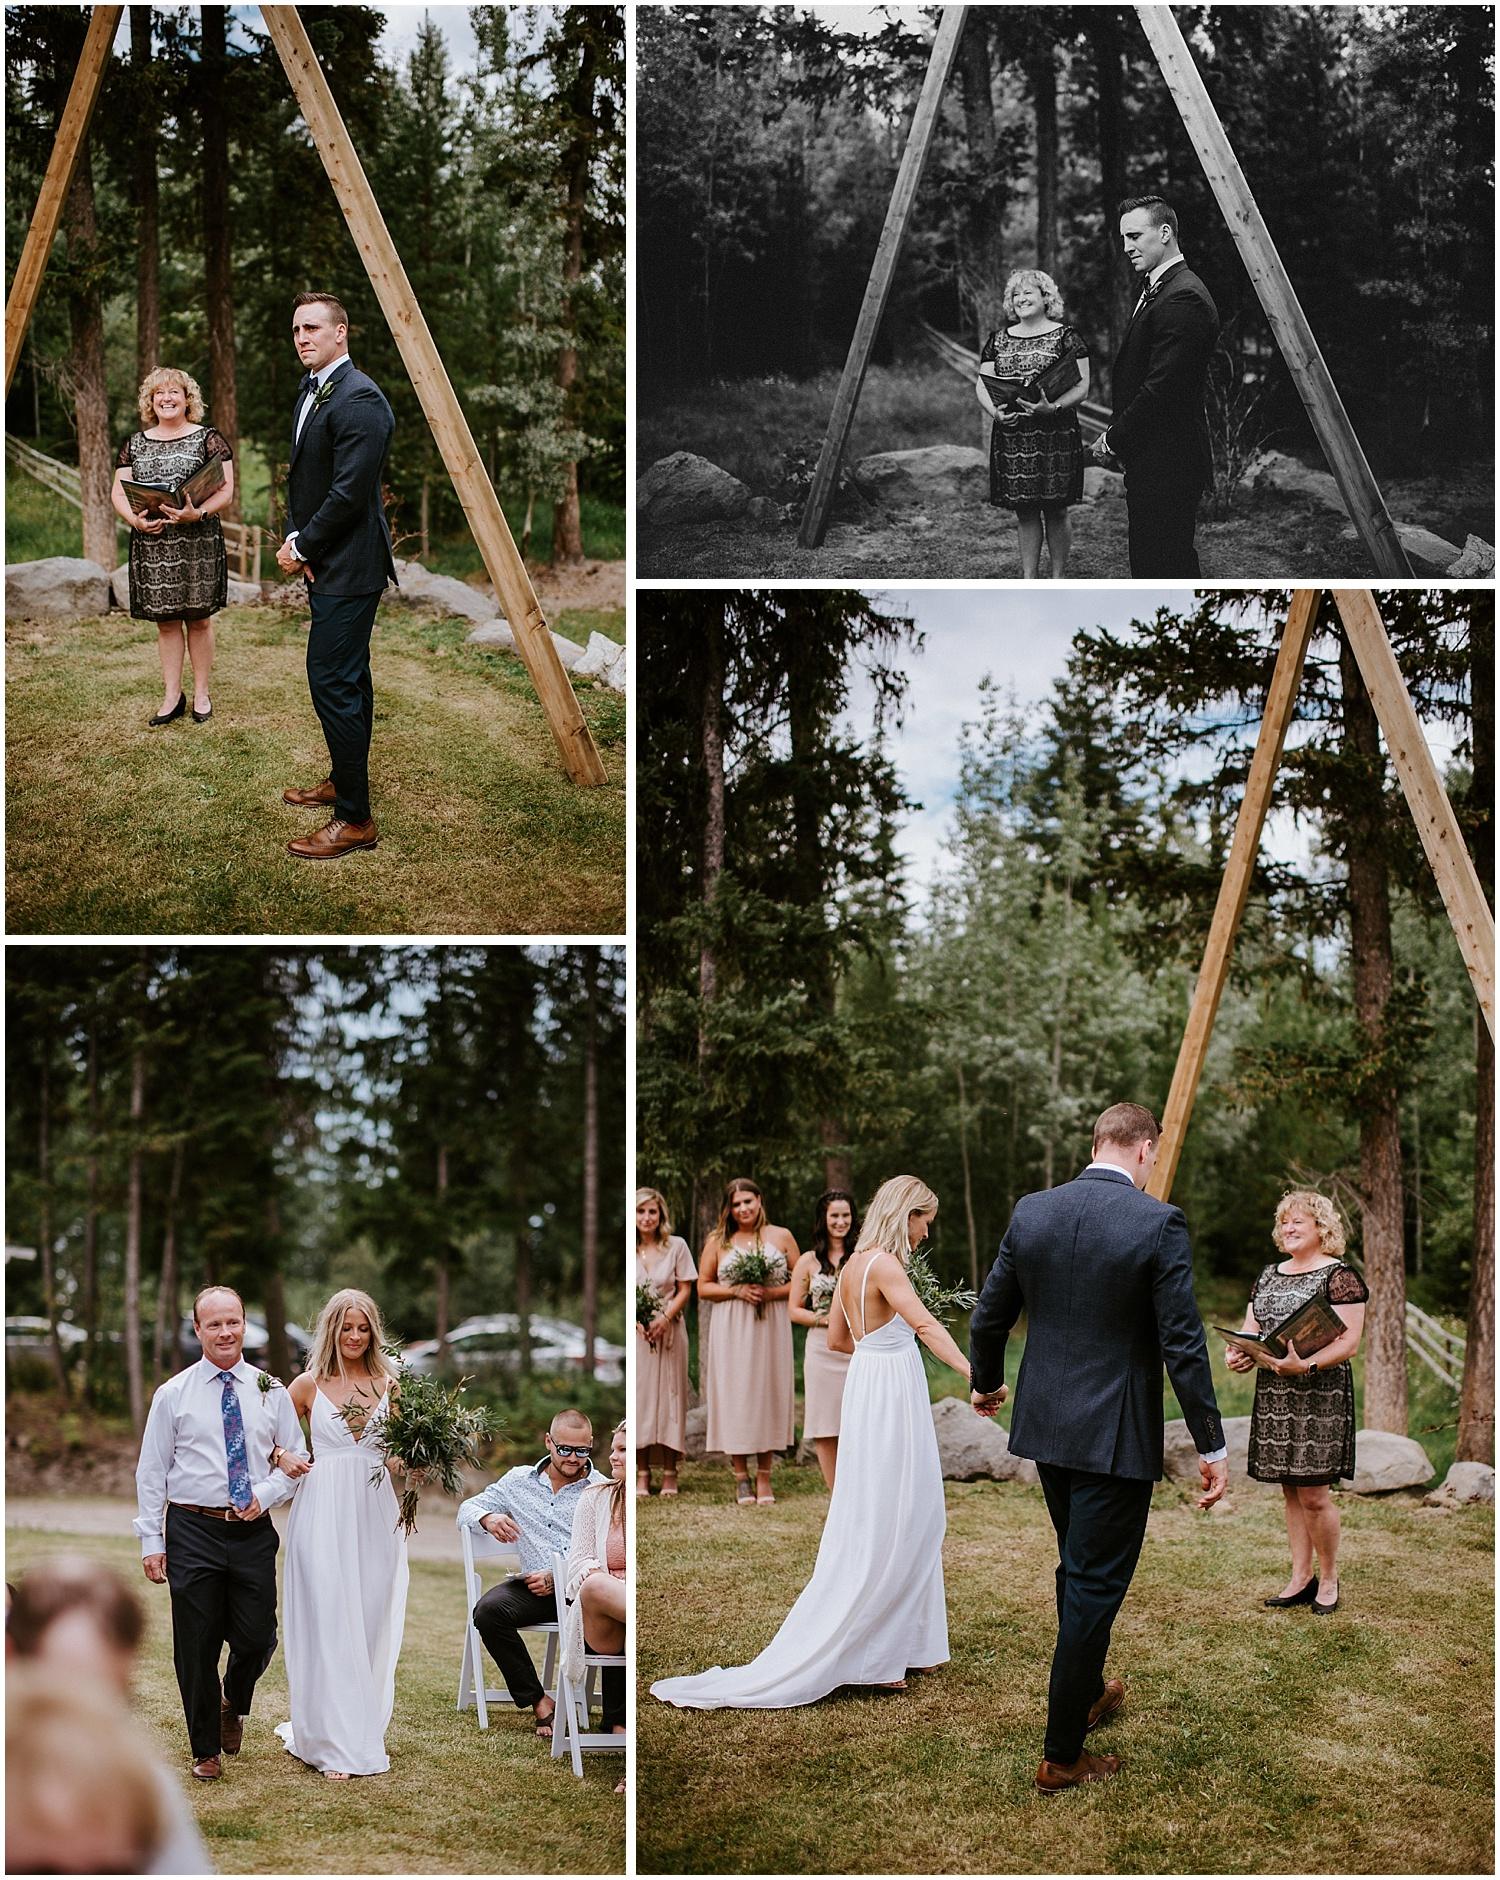 Quesnel_wedding_vancouver_bc_elopement_Pinnacles_Provincial_Park_0184.jpg